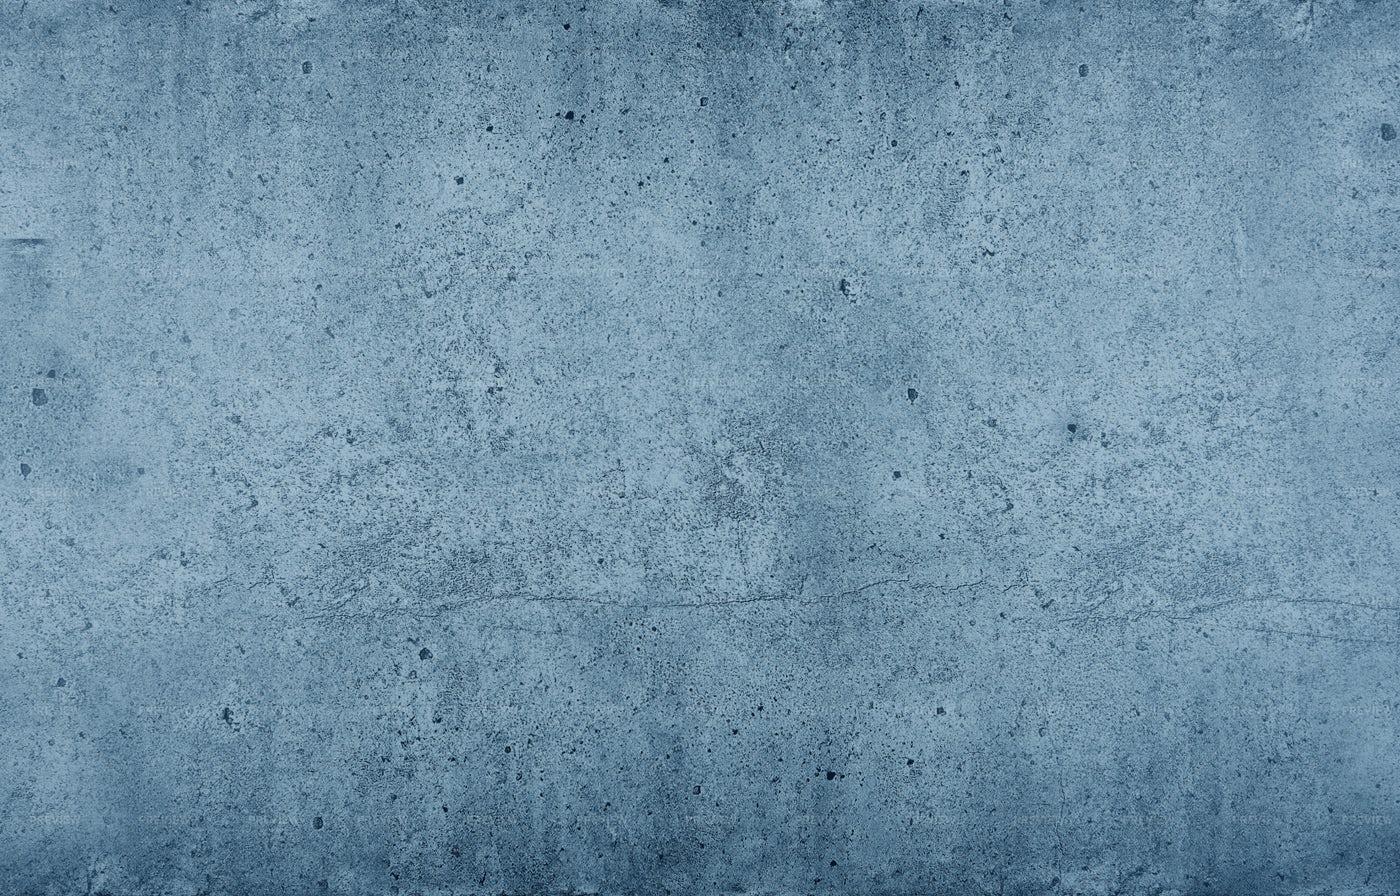 Grunge Blue Background: Stock Photos